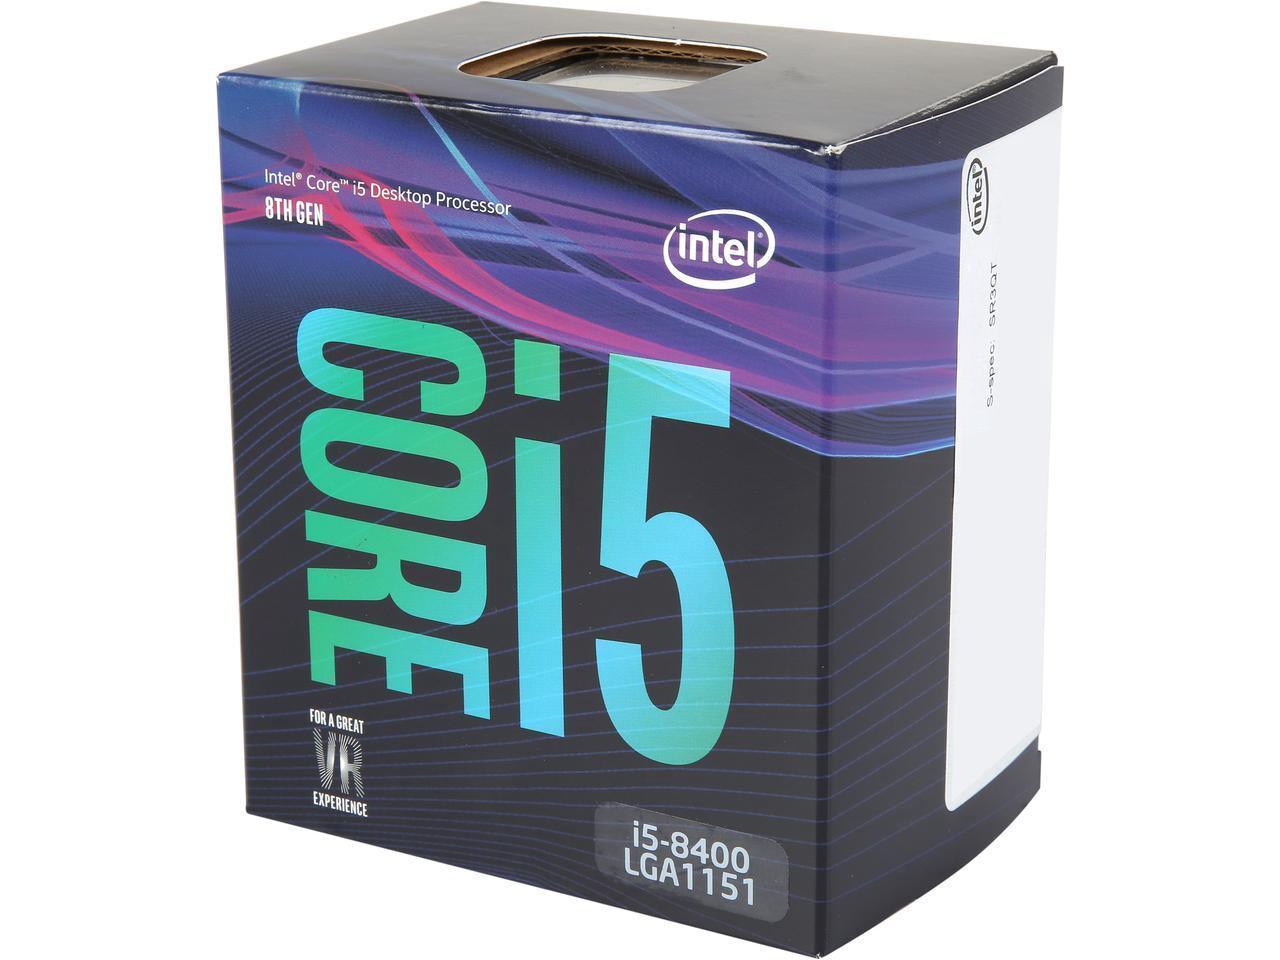 Intel Core i5-8400 Coffee Lake 6-Core 2.8 GHz (4.0 GHz Turbo) LGA 1151v2